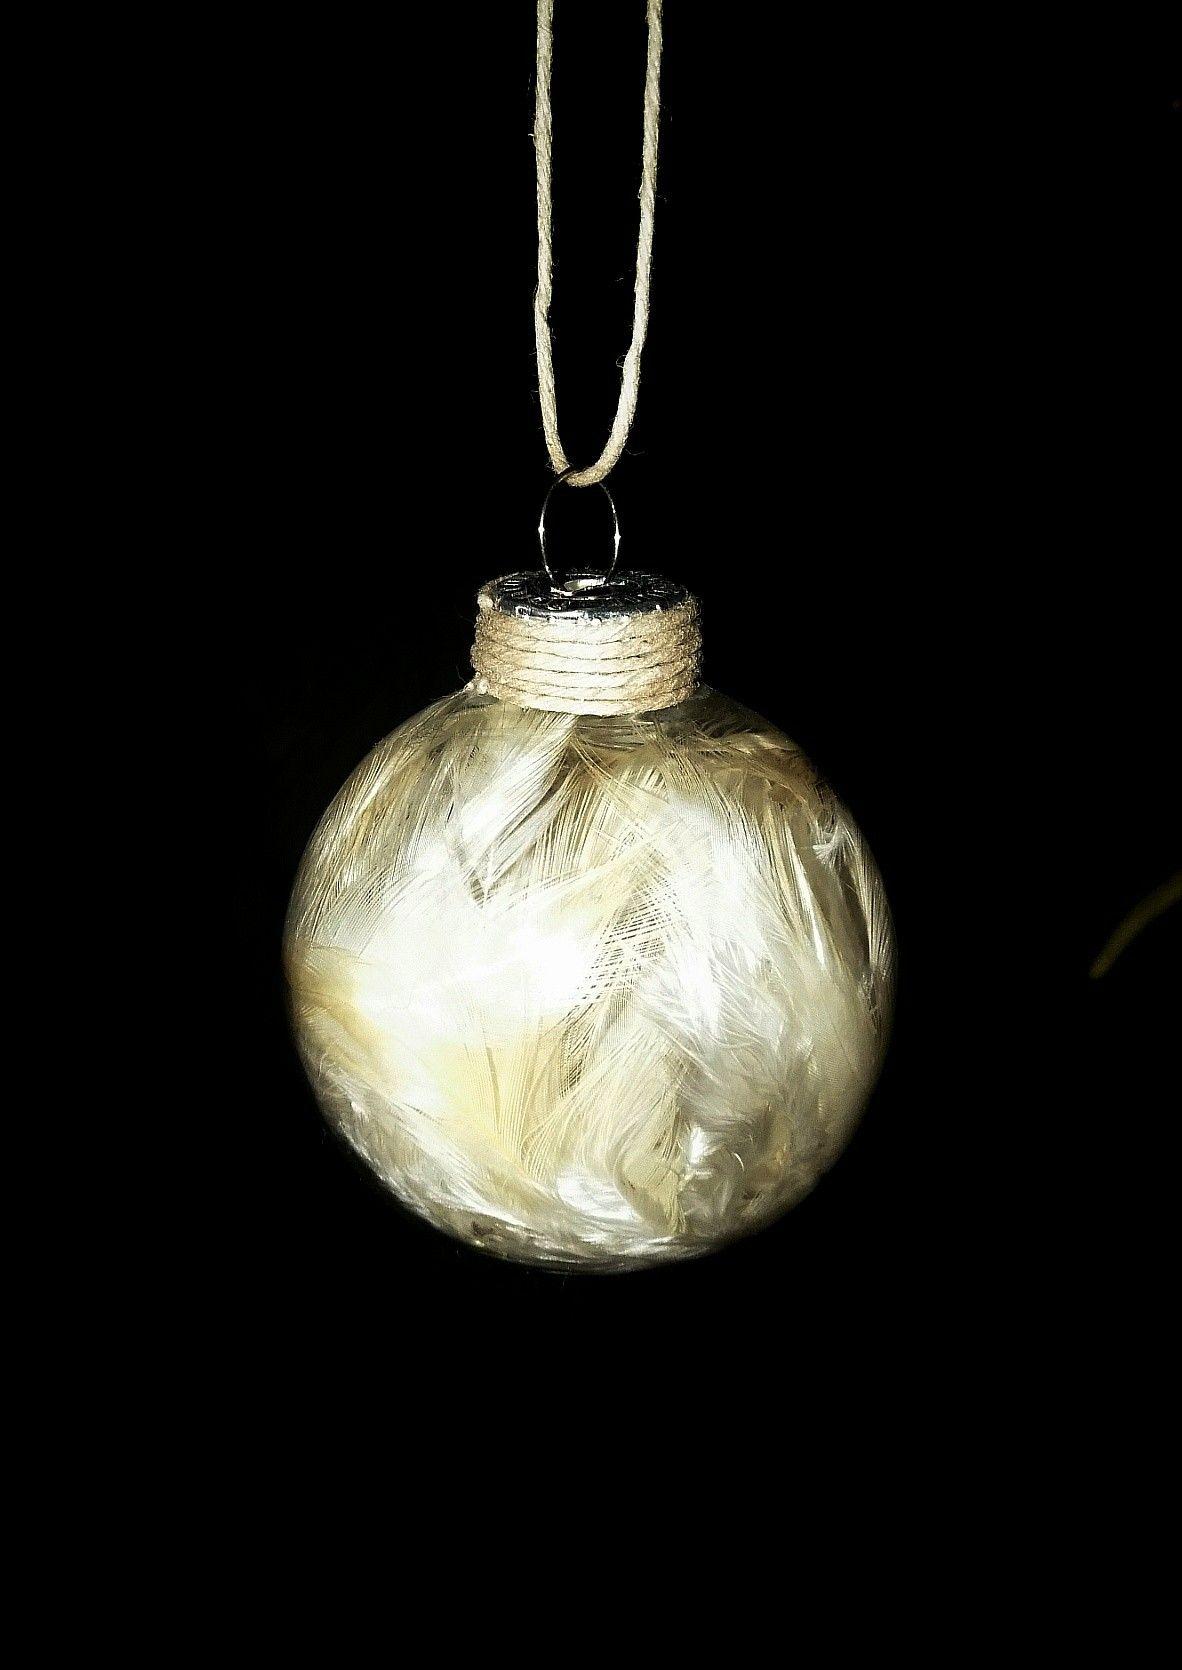 Pin by Trú Gems & Minerals on Ornaments   Christmas bulbs ...